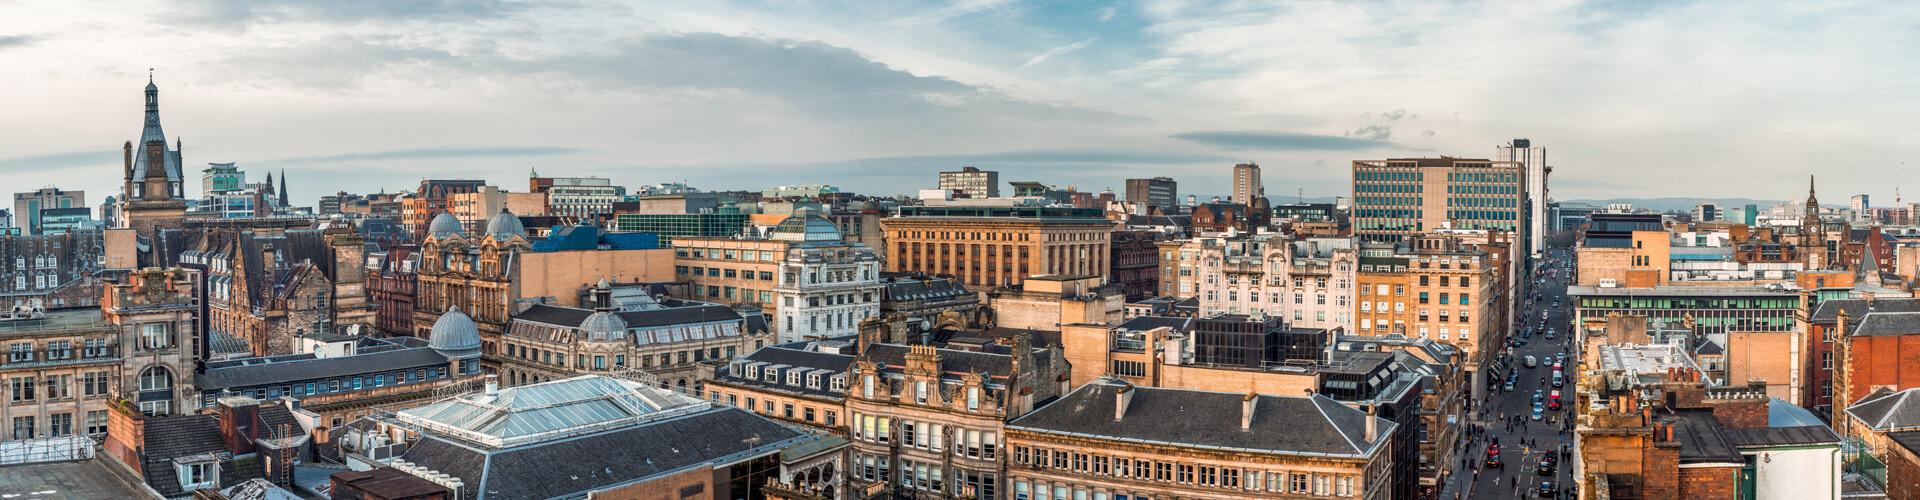 Digital tax system running smoothly for Revenue Scotland